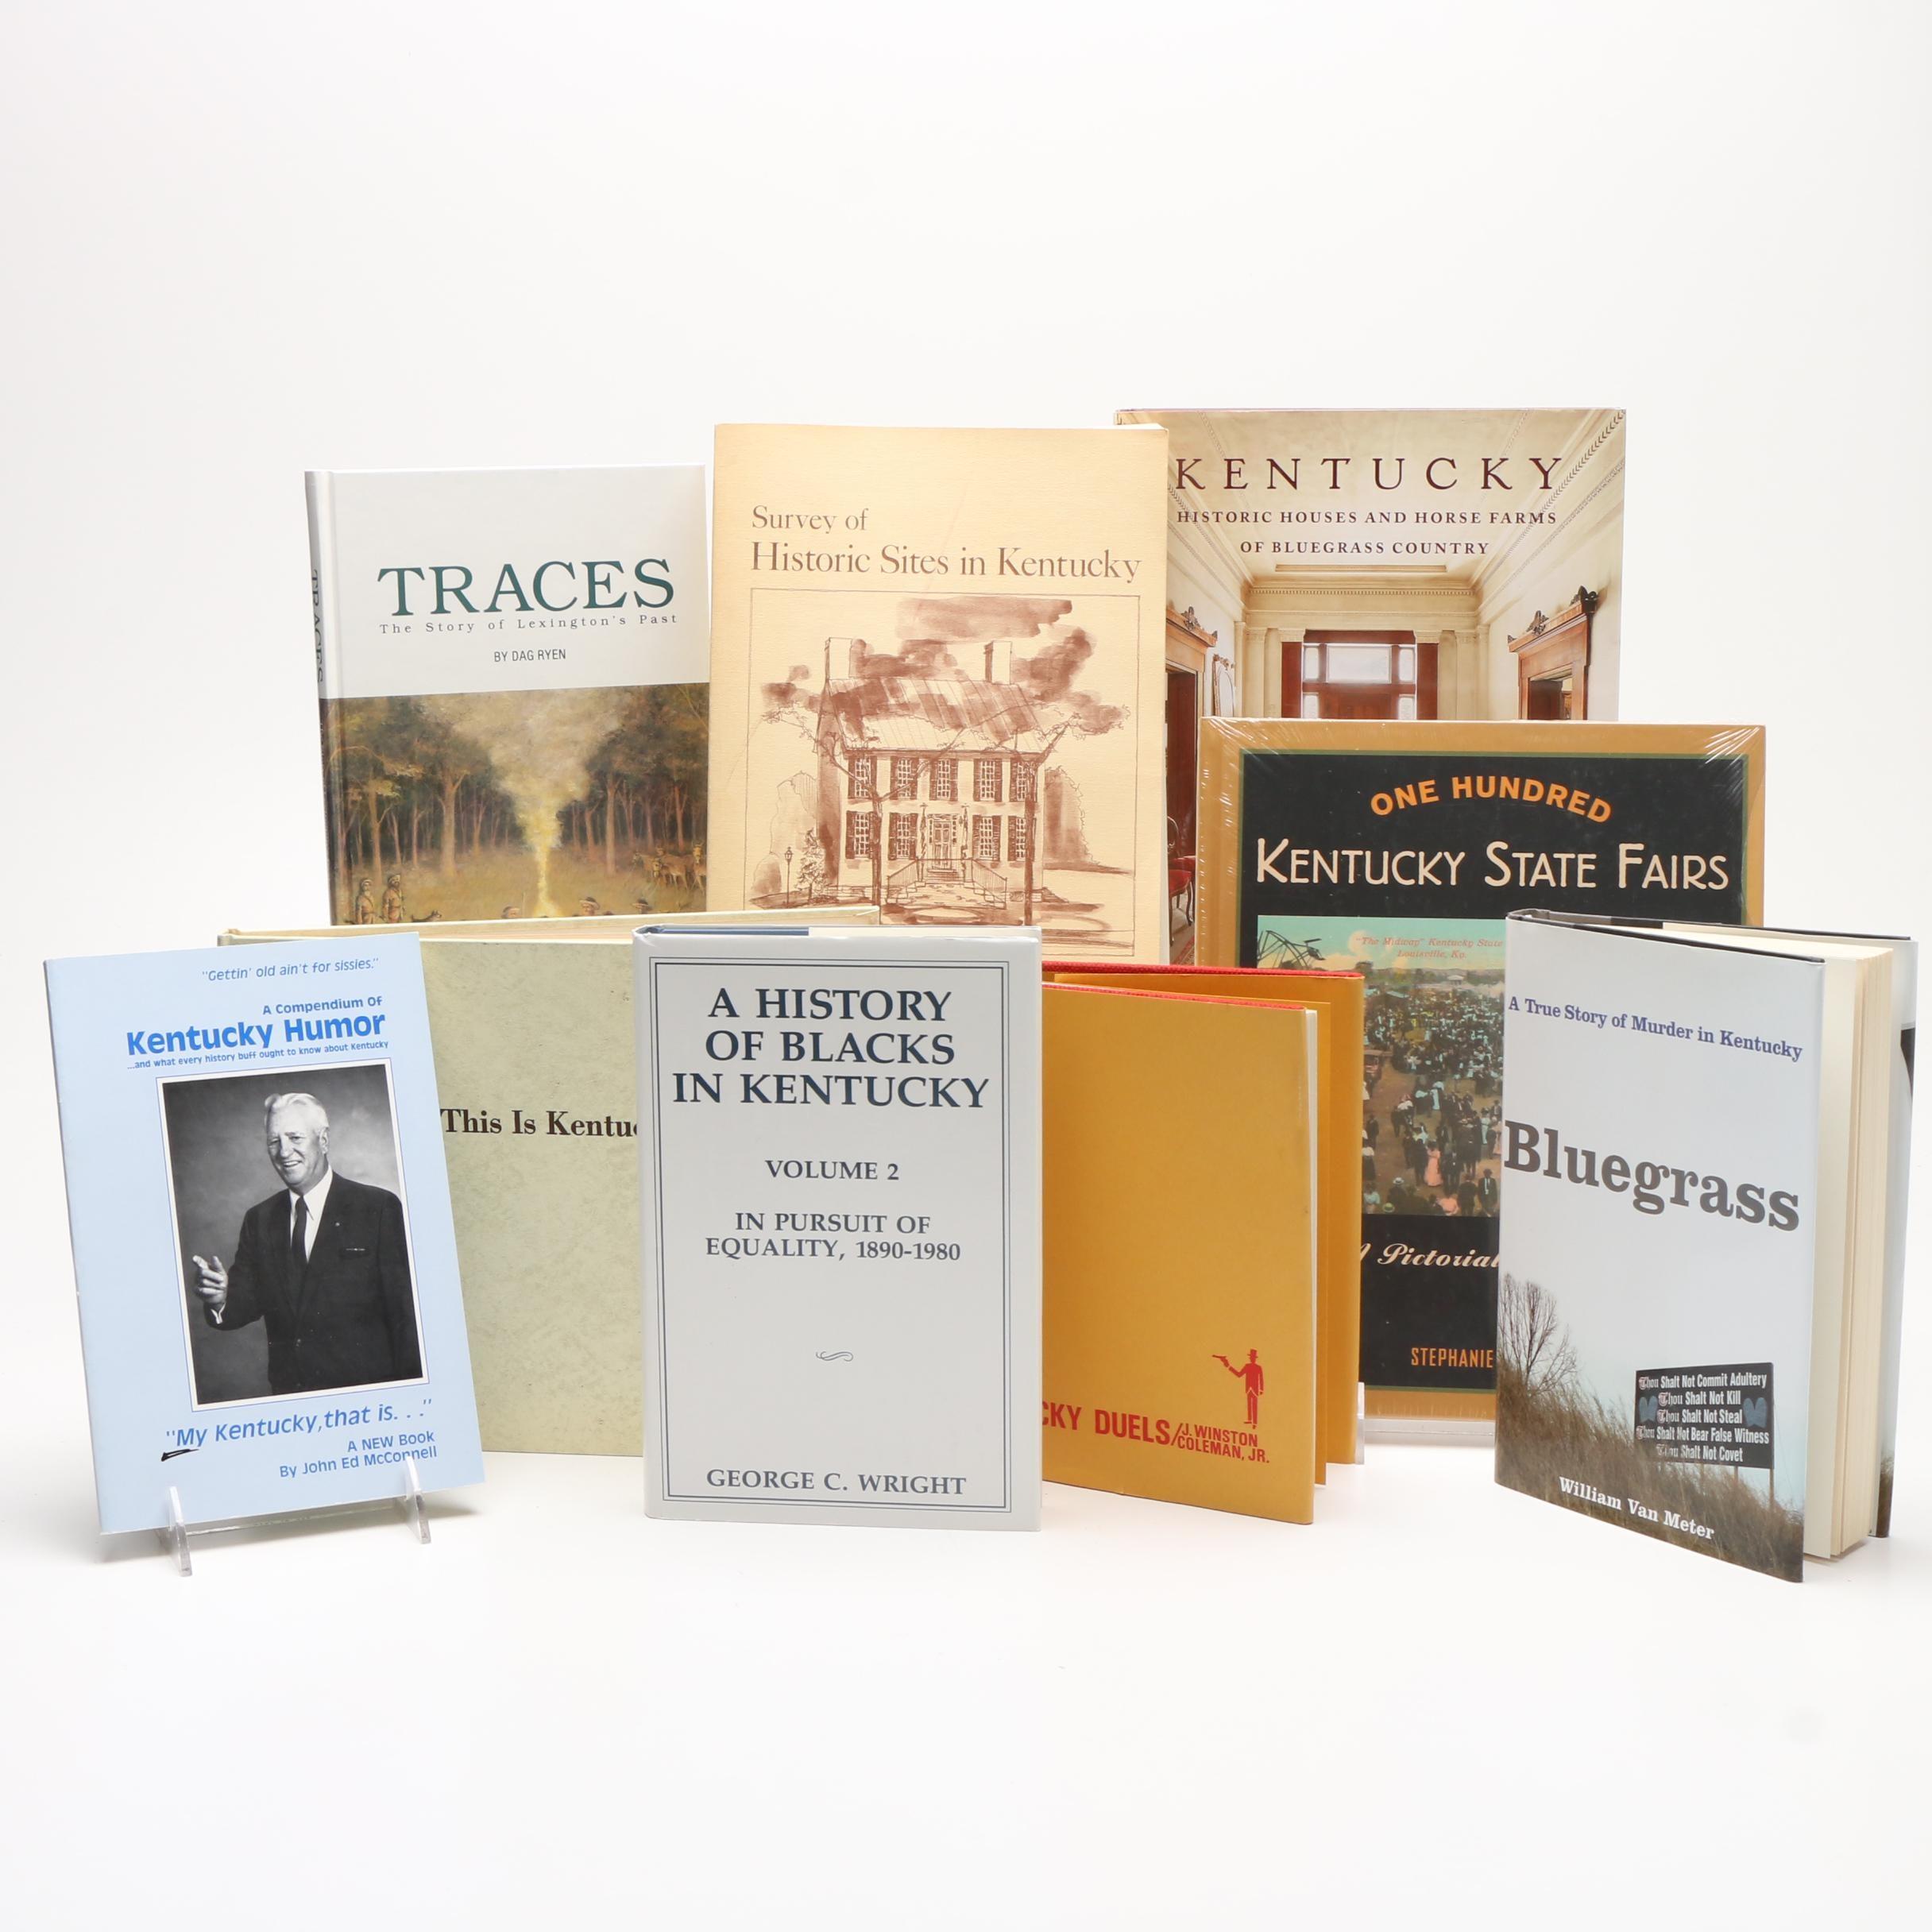 Books on Kentucky